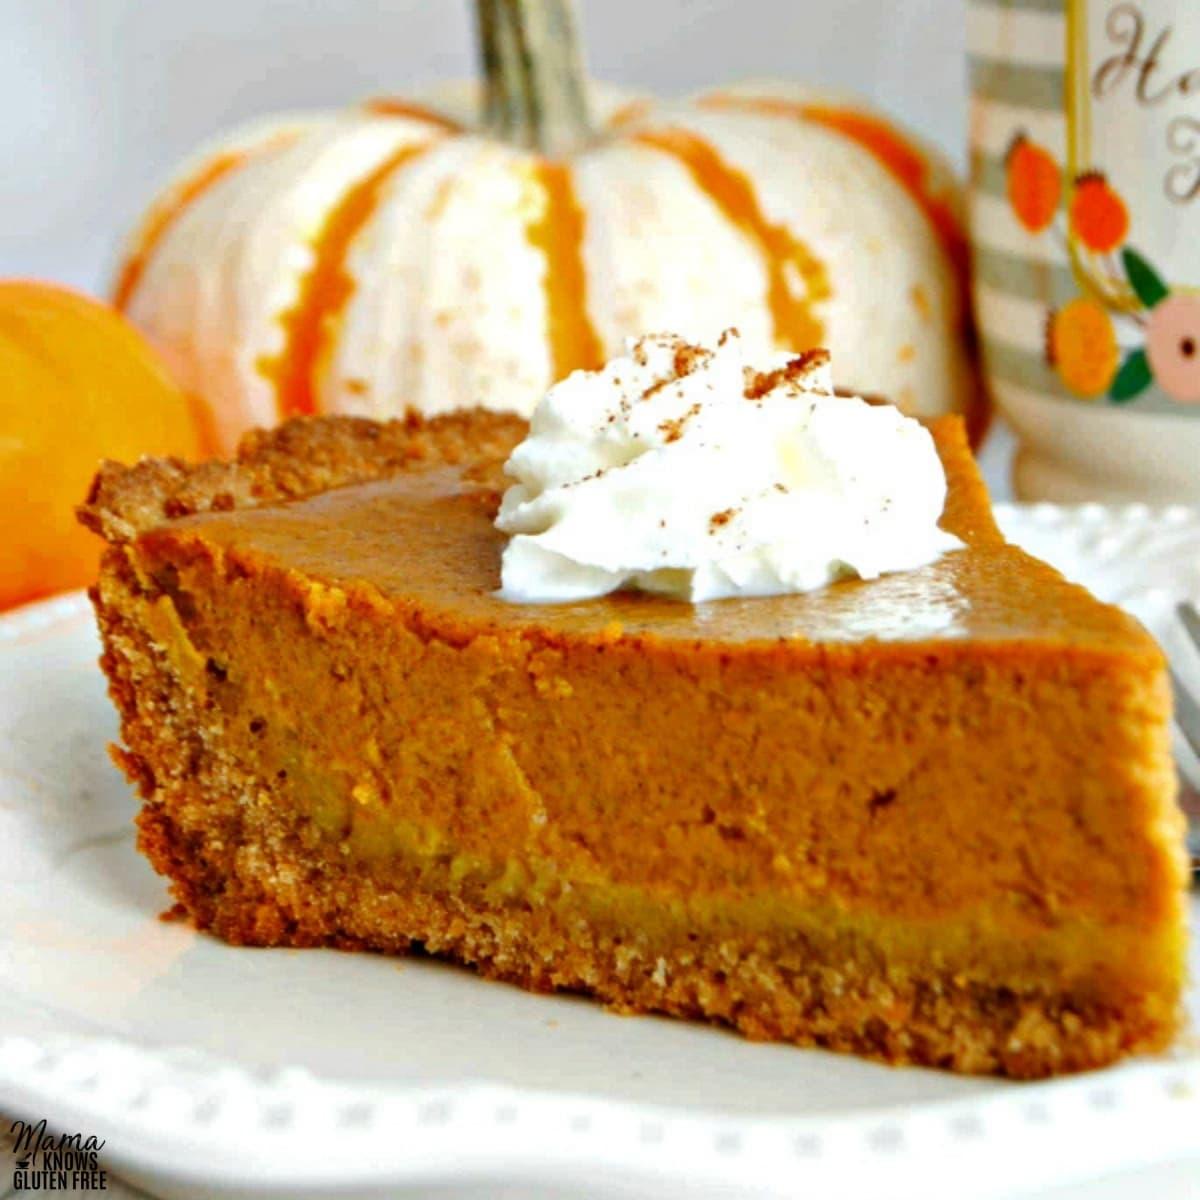 gluten-free pumpkin pie slice on a white plate with pumpkins in the background